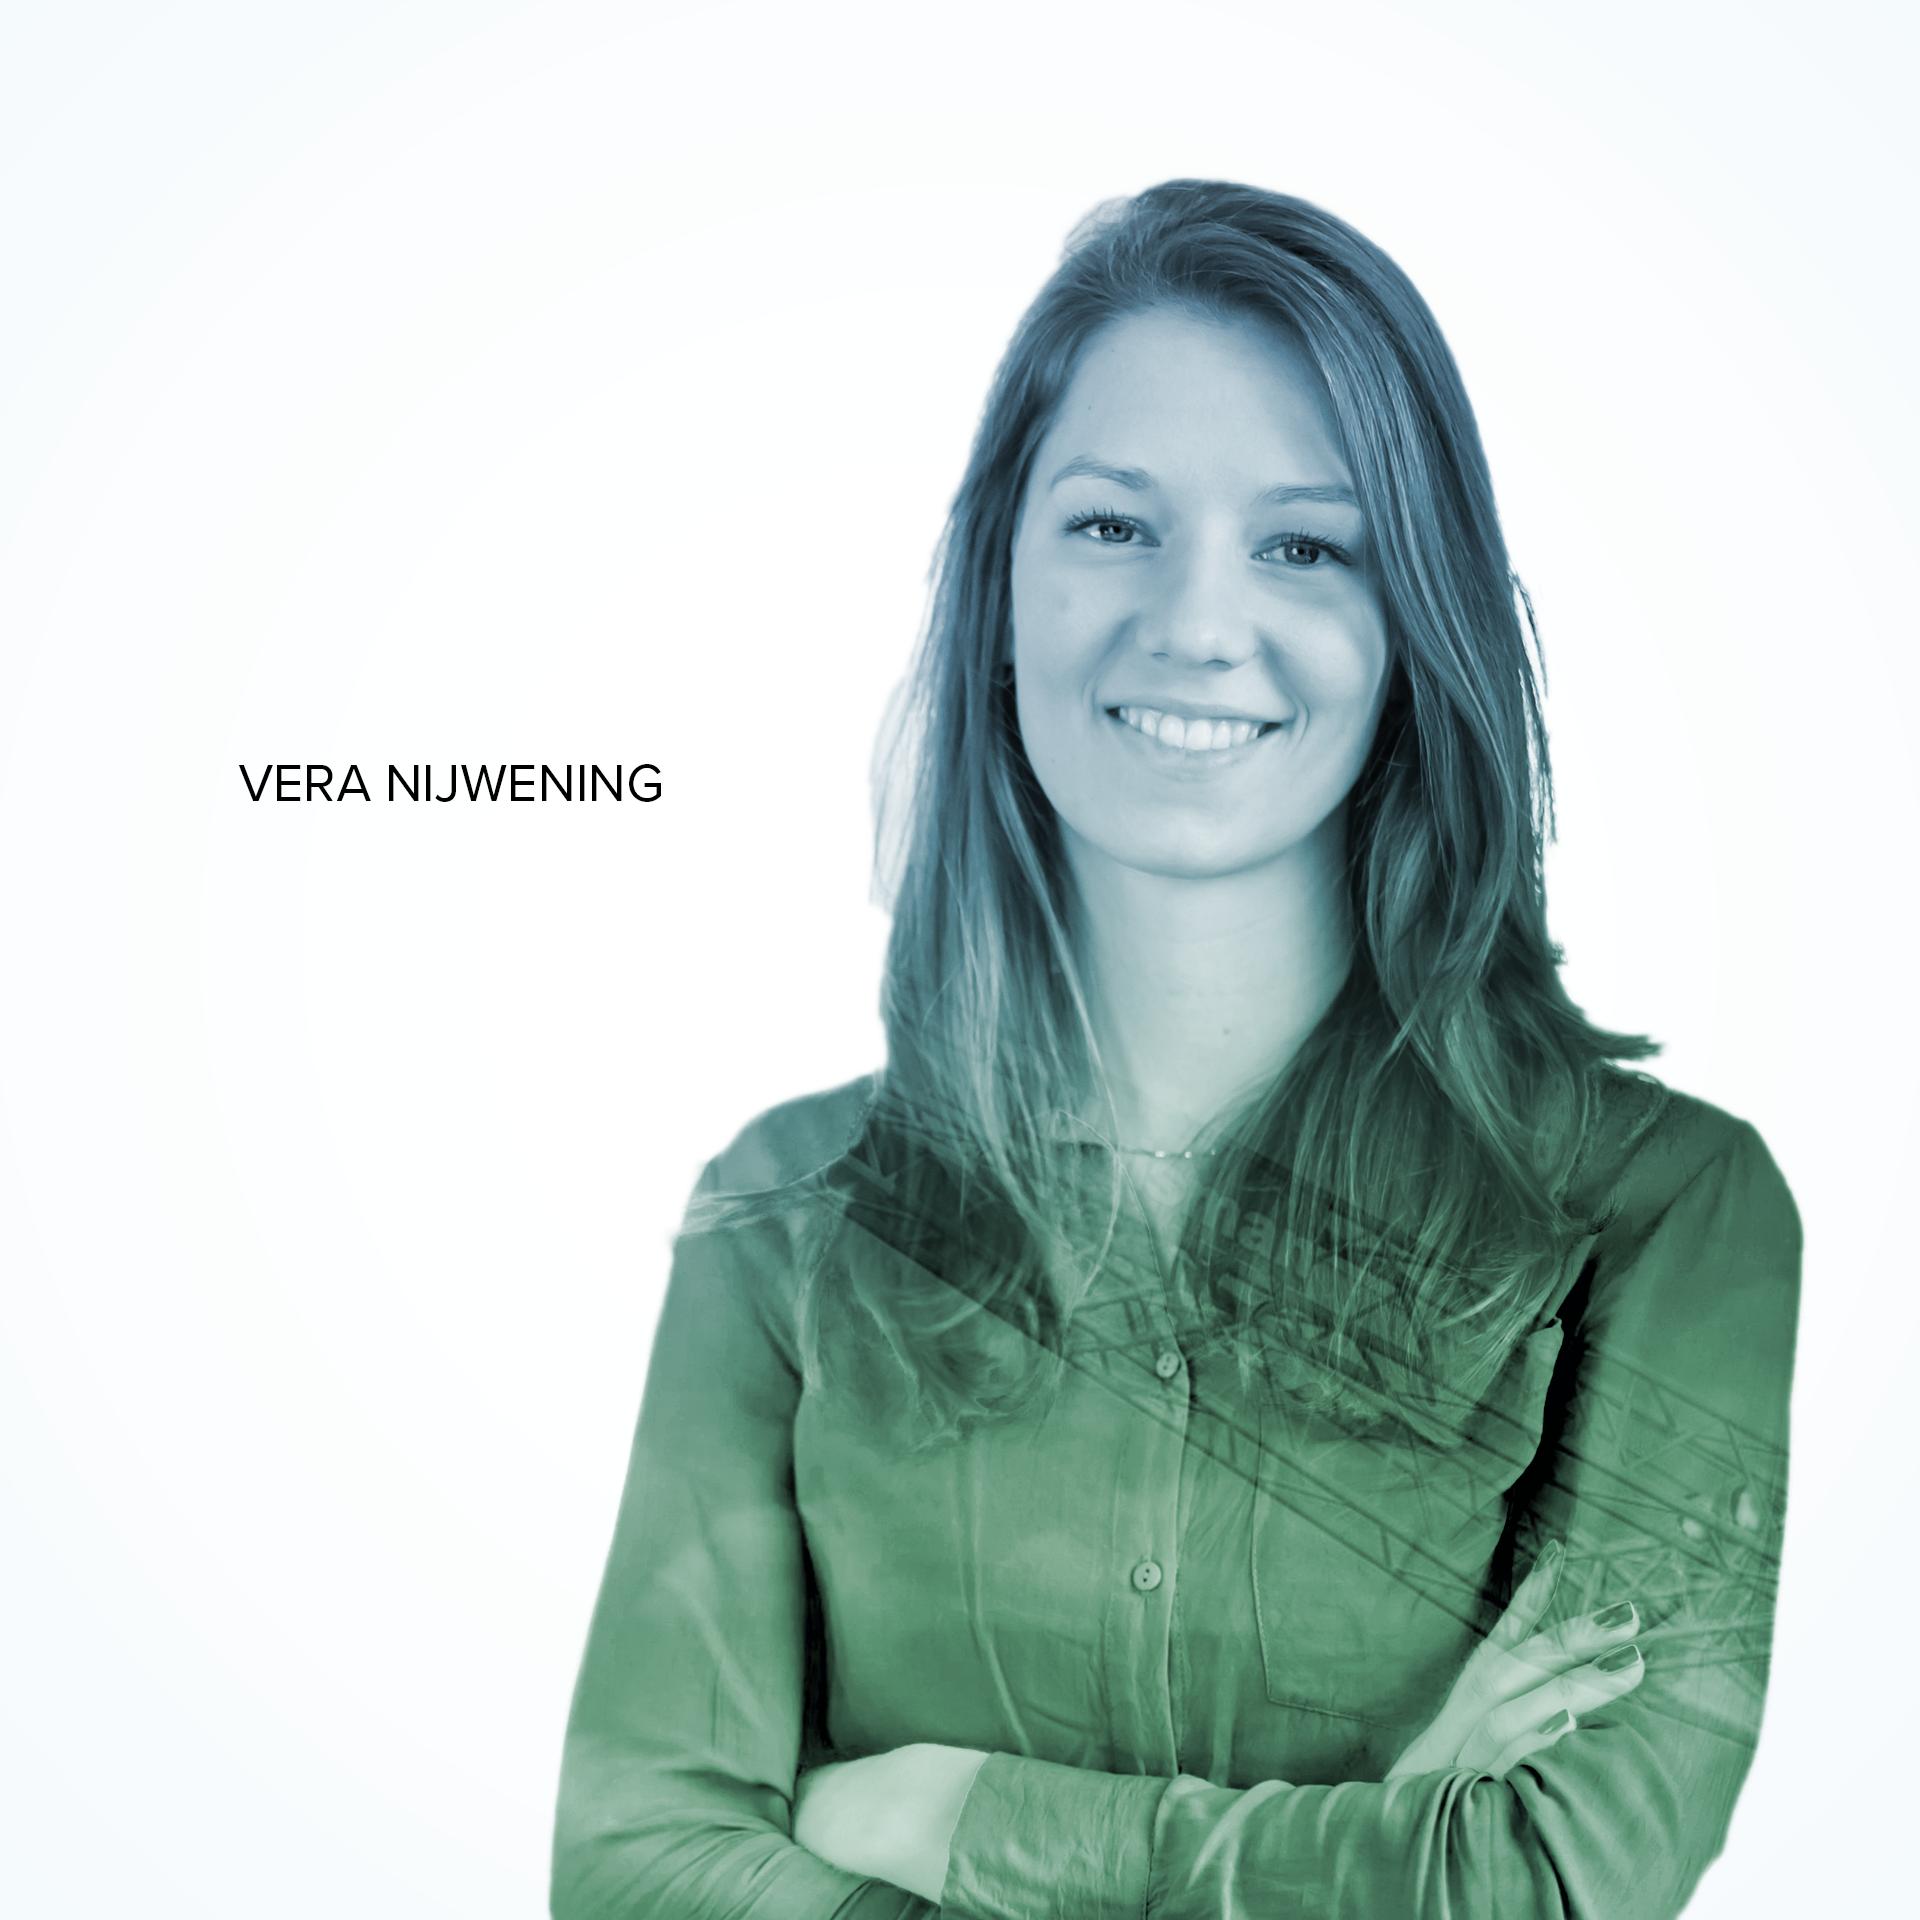 Announcement: Vera Nijwening new Young IRO board member